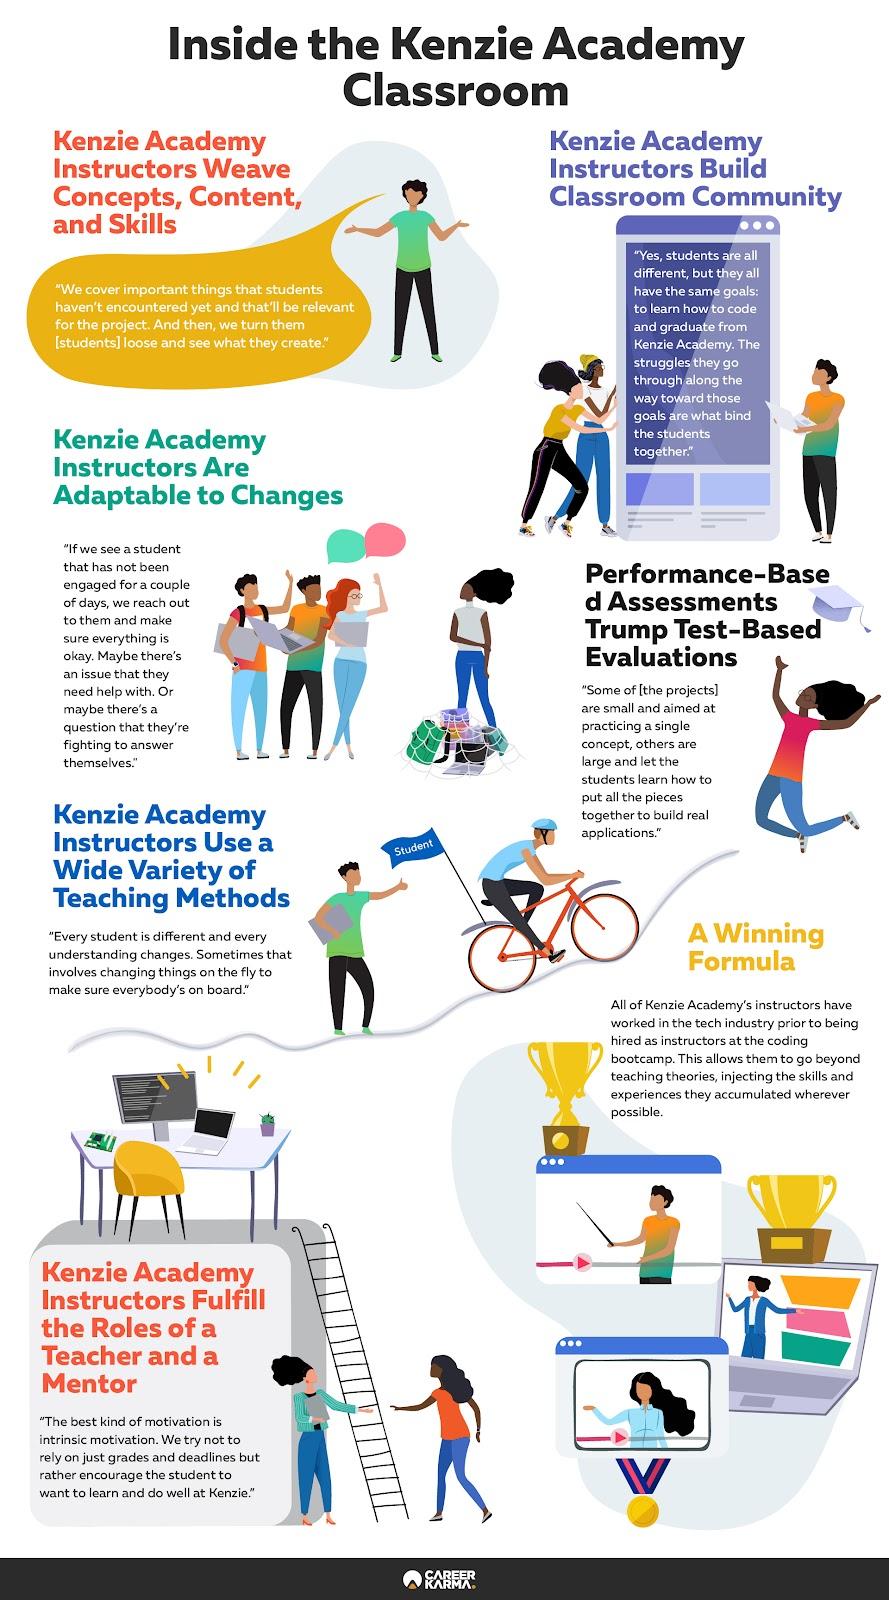 Inside the Kenzie Academy Classroom: Instructors' Spotlight